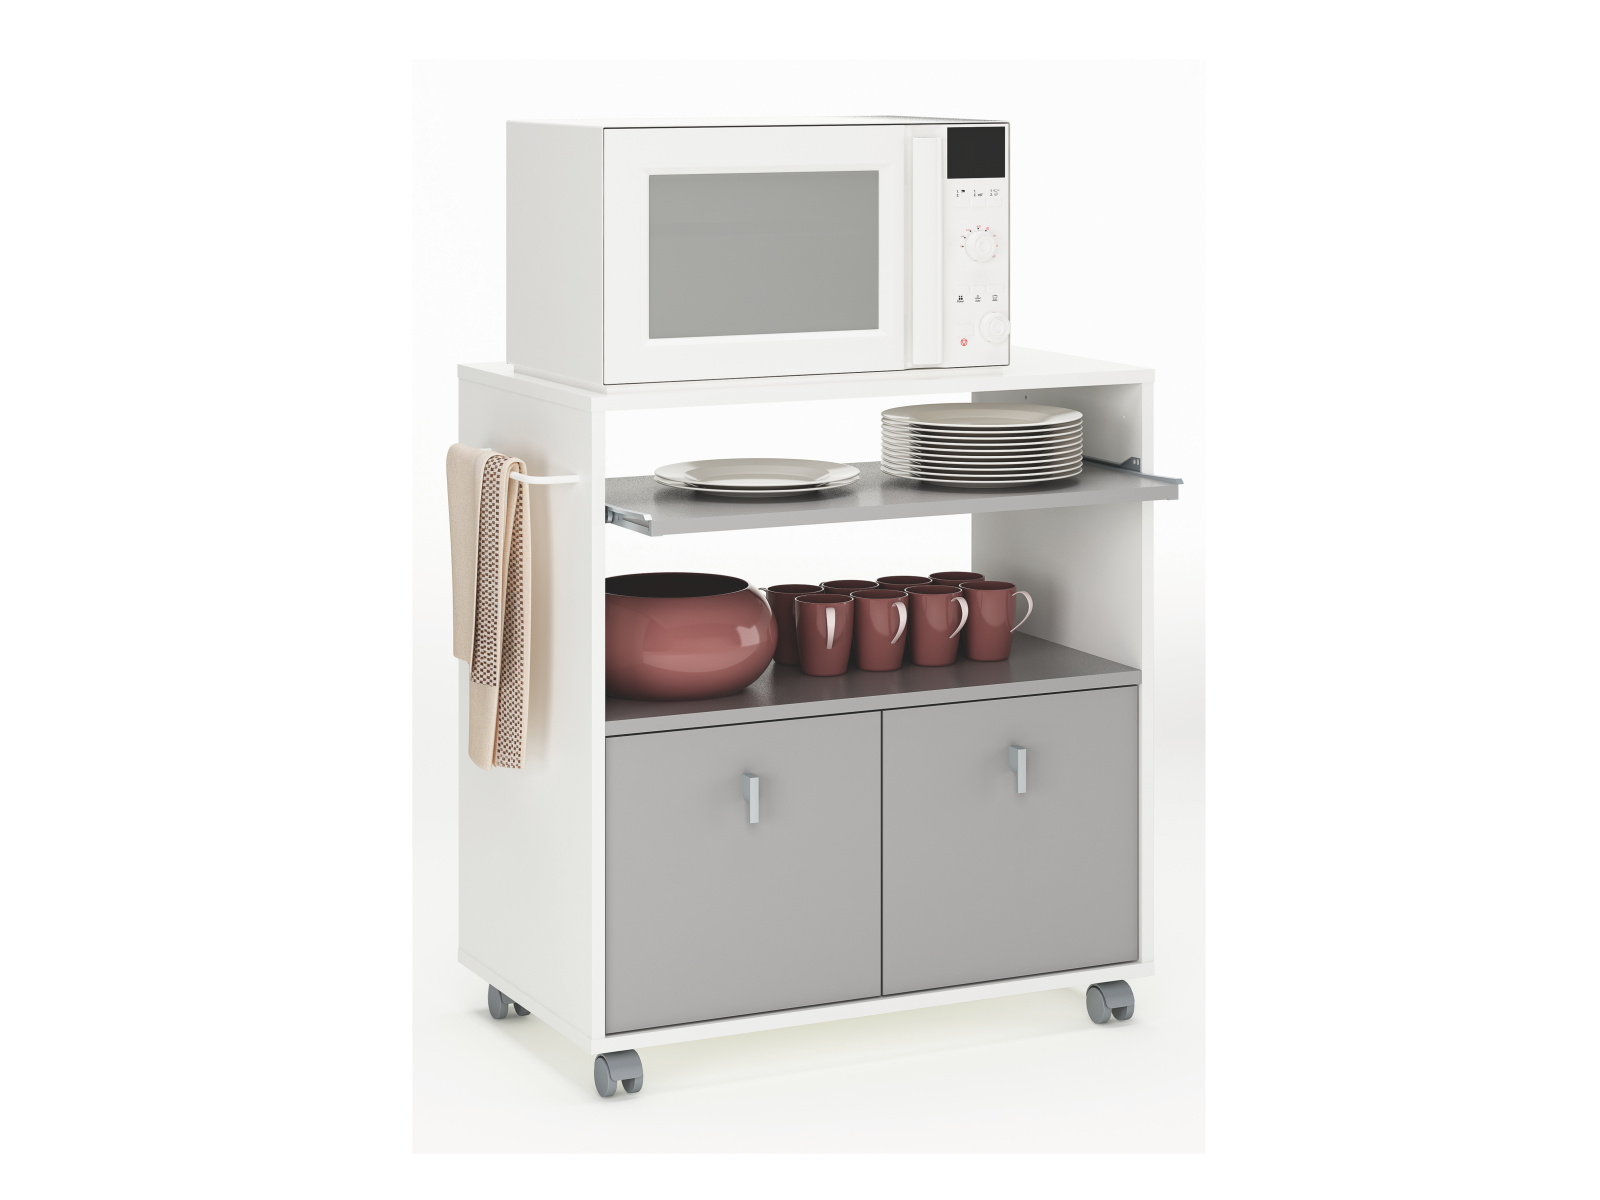 DEMEYERE APREGE, kuchyňská skříňka, bílá/čedič